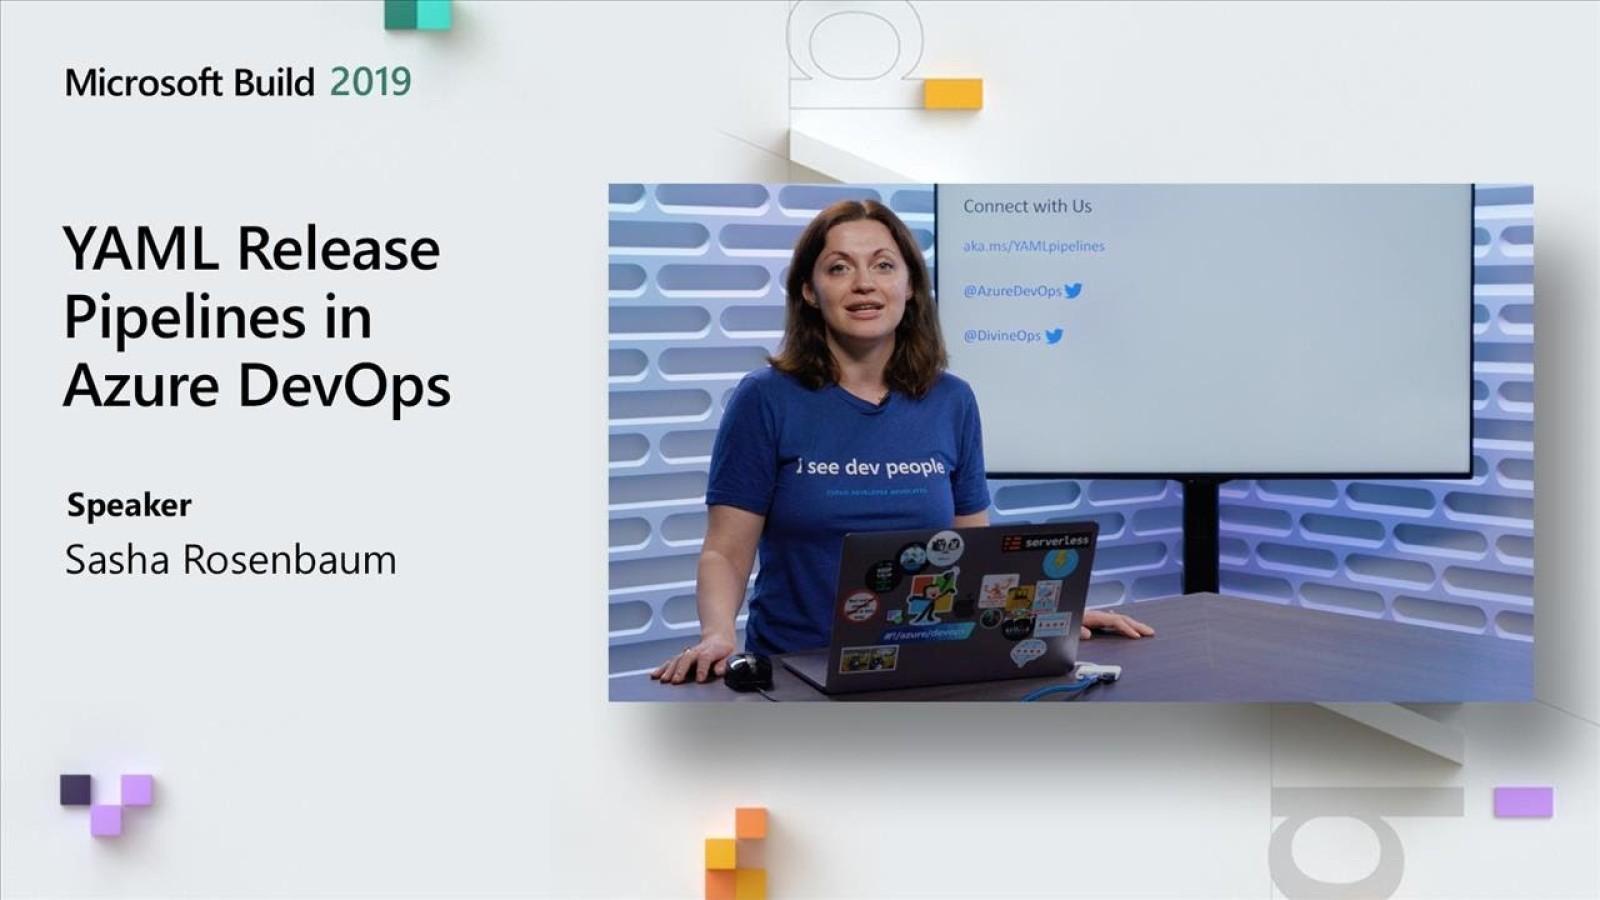 YAML Release Pipelines in Azure DevOps - MSBuild 2019